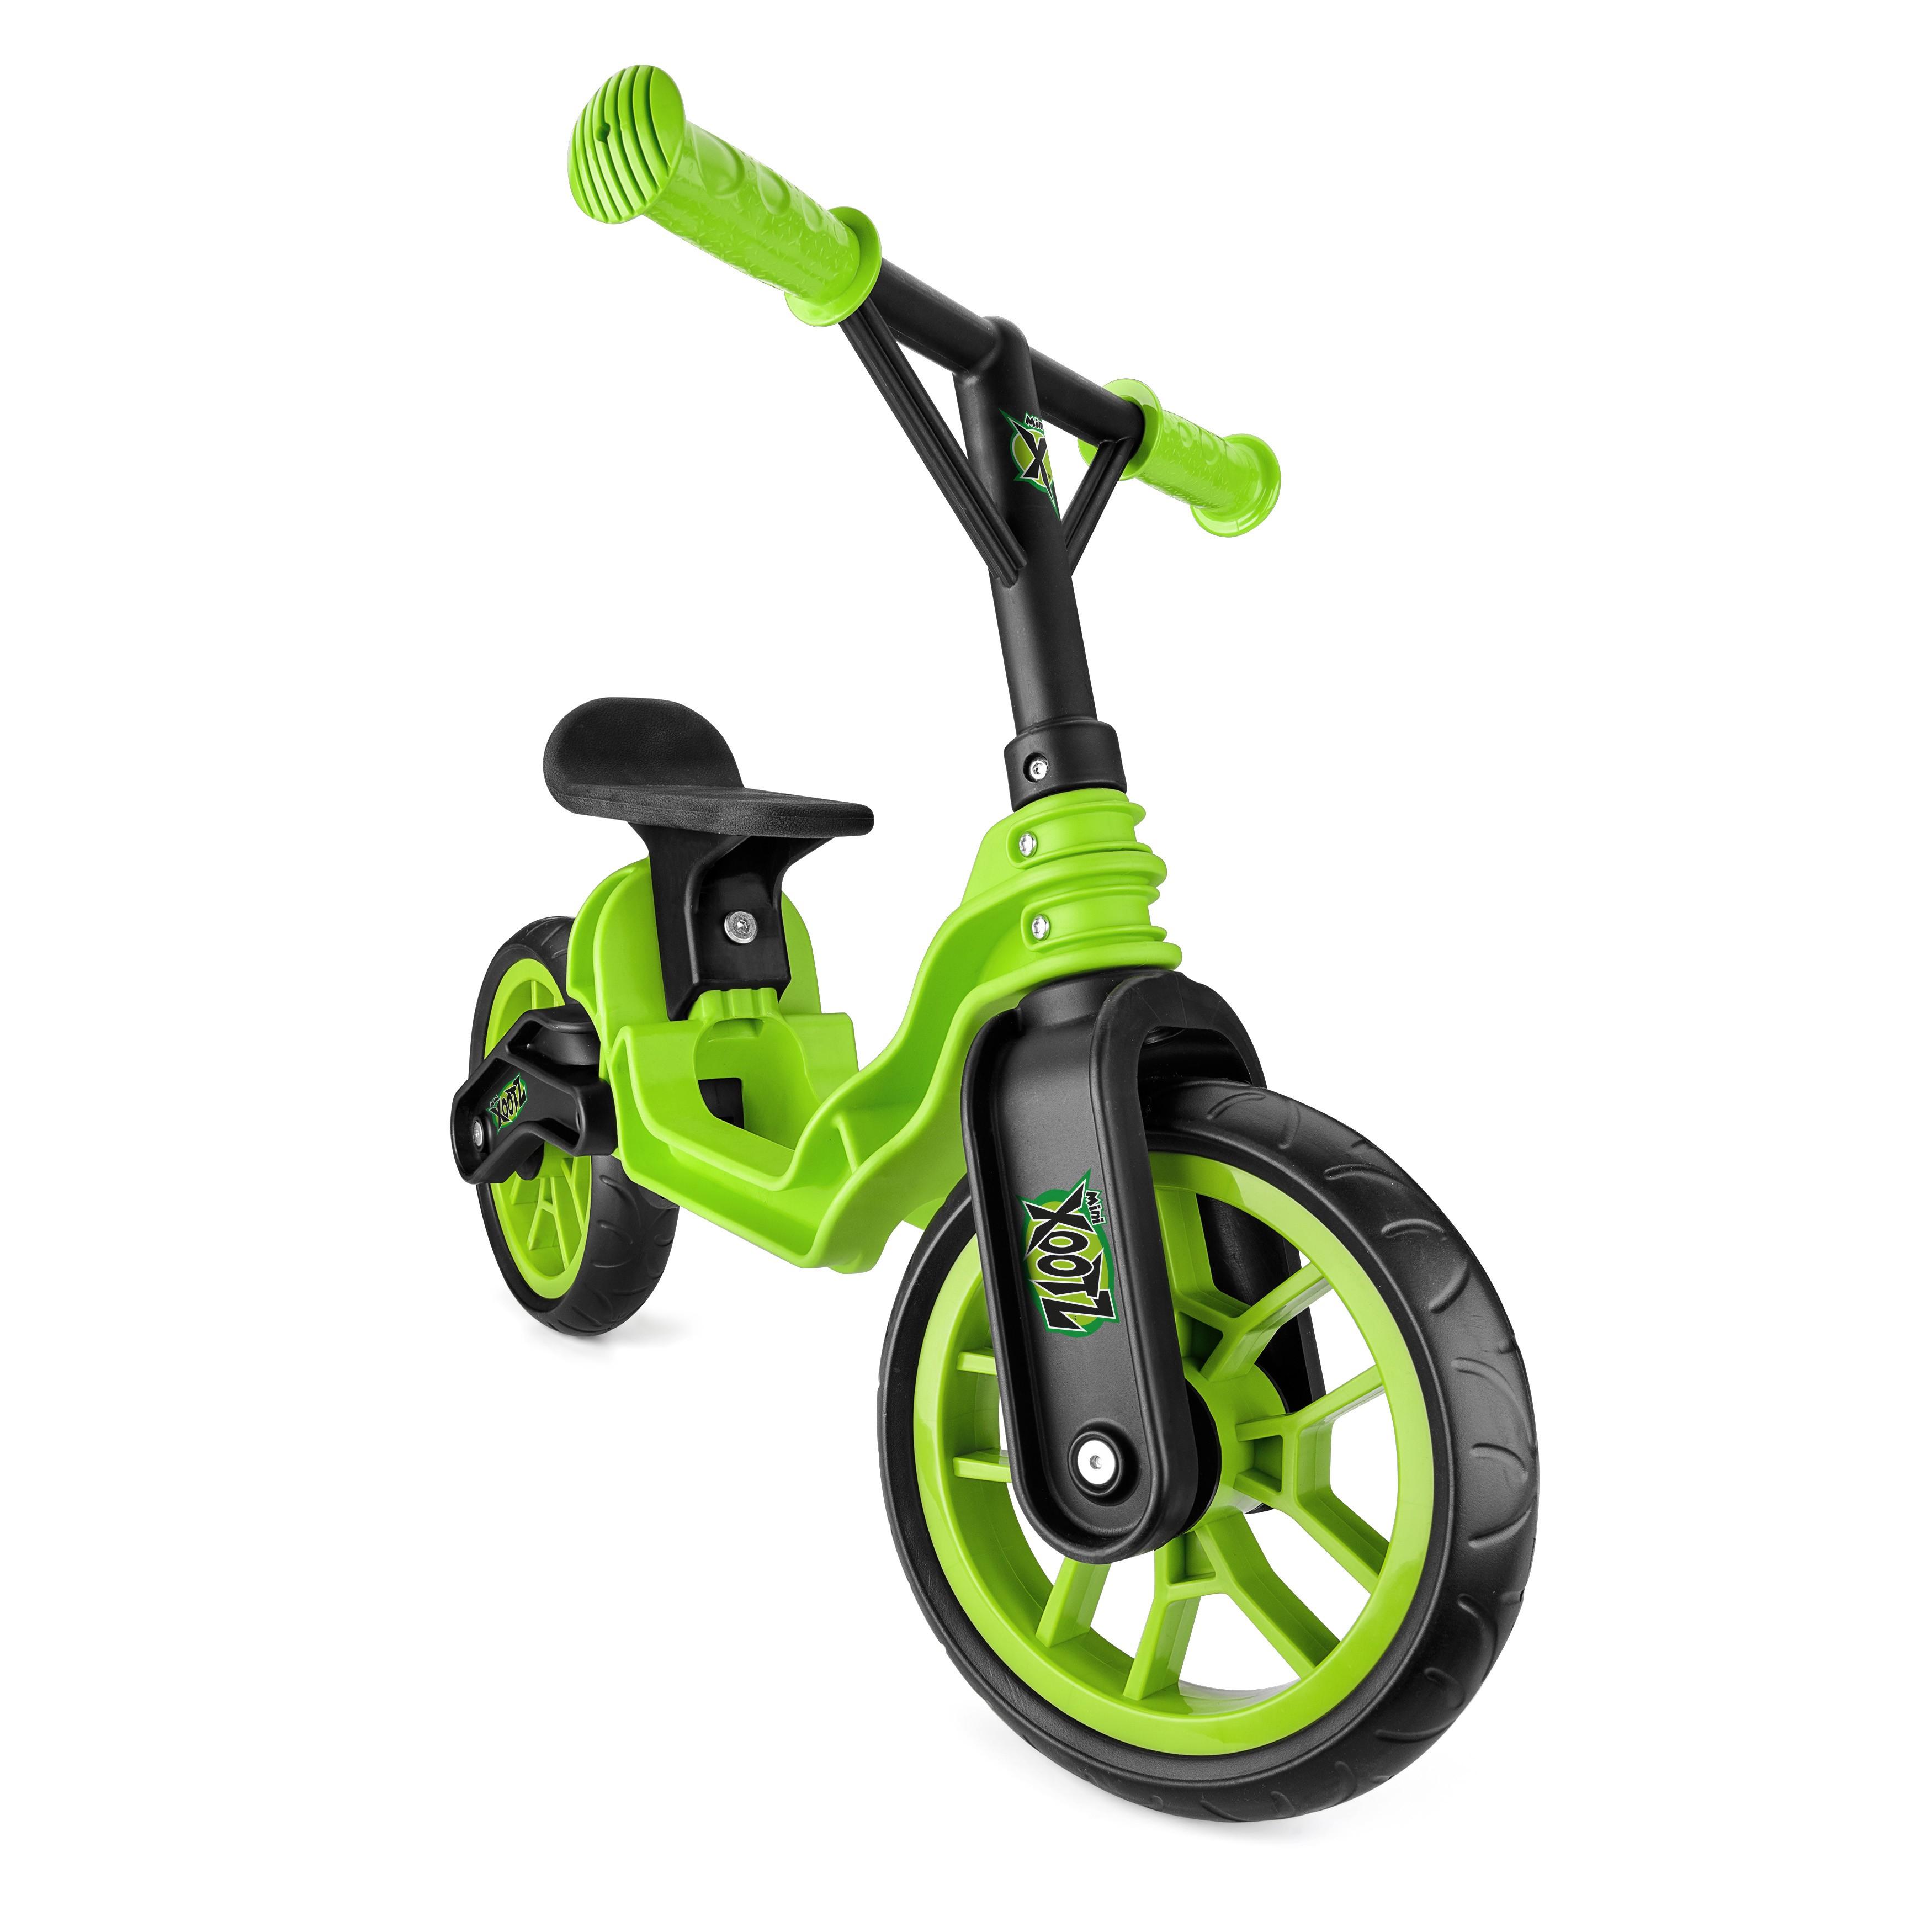 Xootz Green Folding Balance Bike